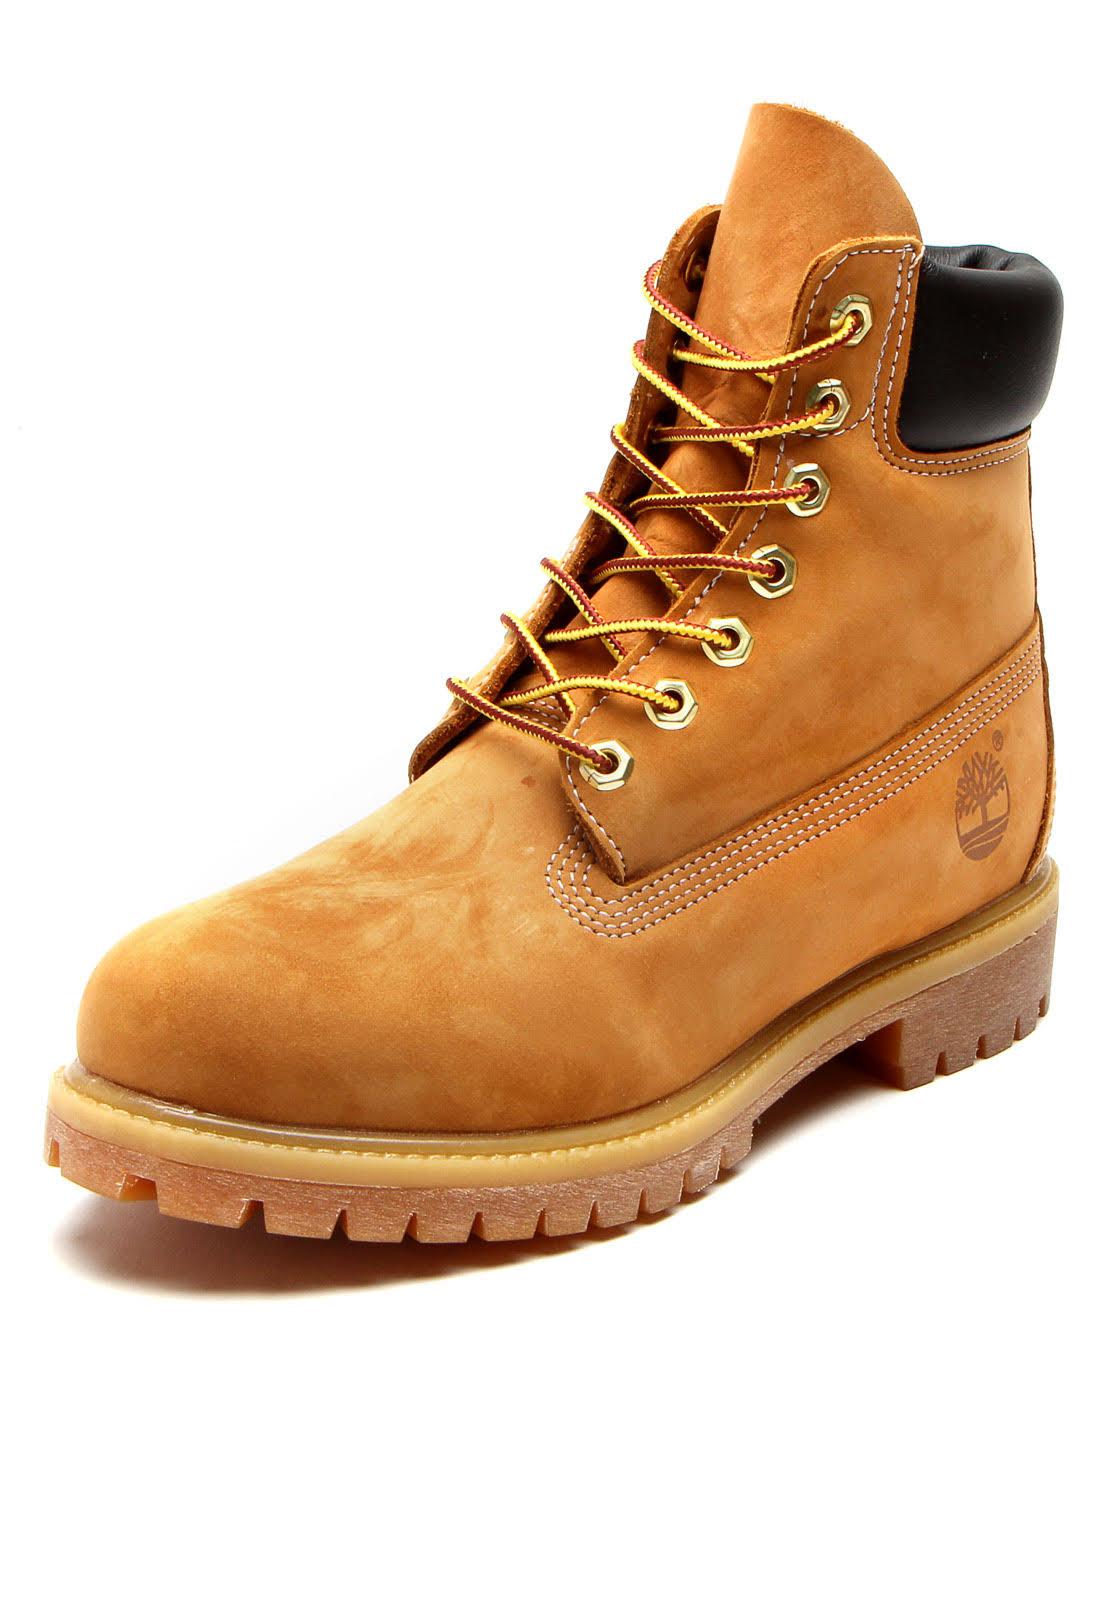 Boot Premium Couro Wp Bota Yellow 6in Caramelo Timberland wzFCXxqt4